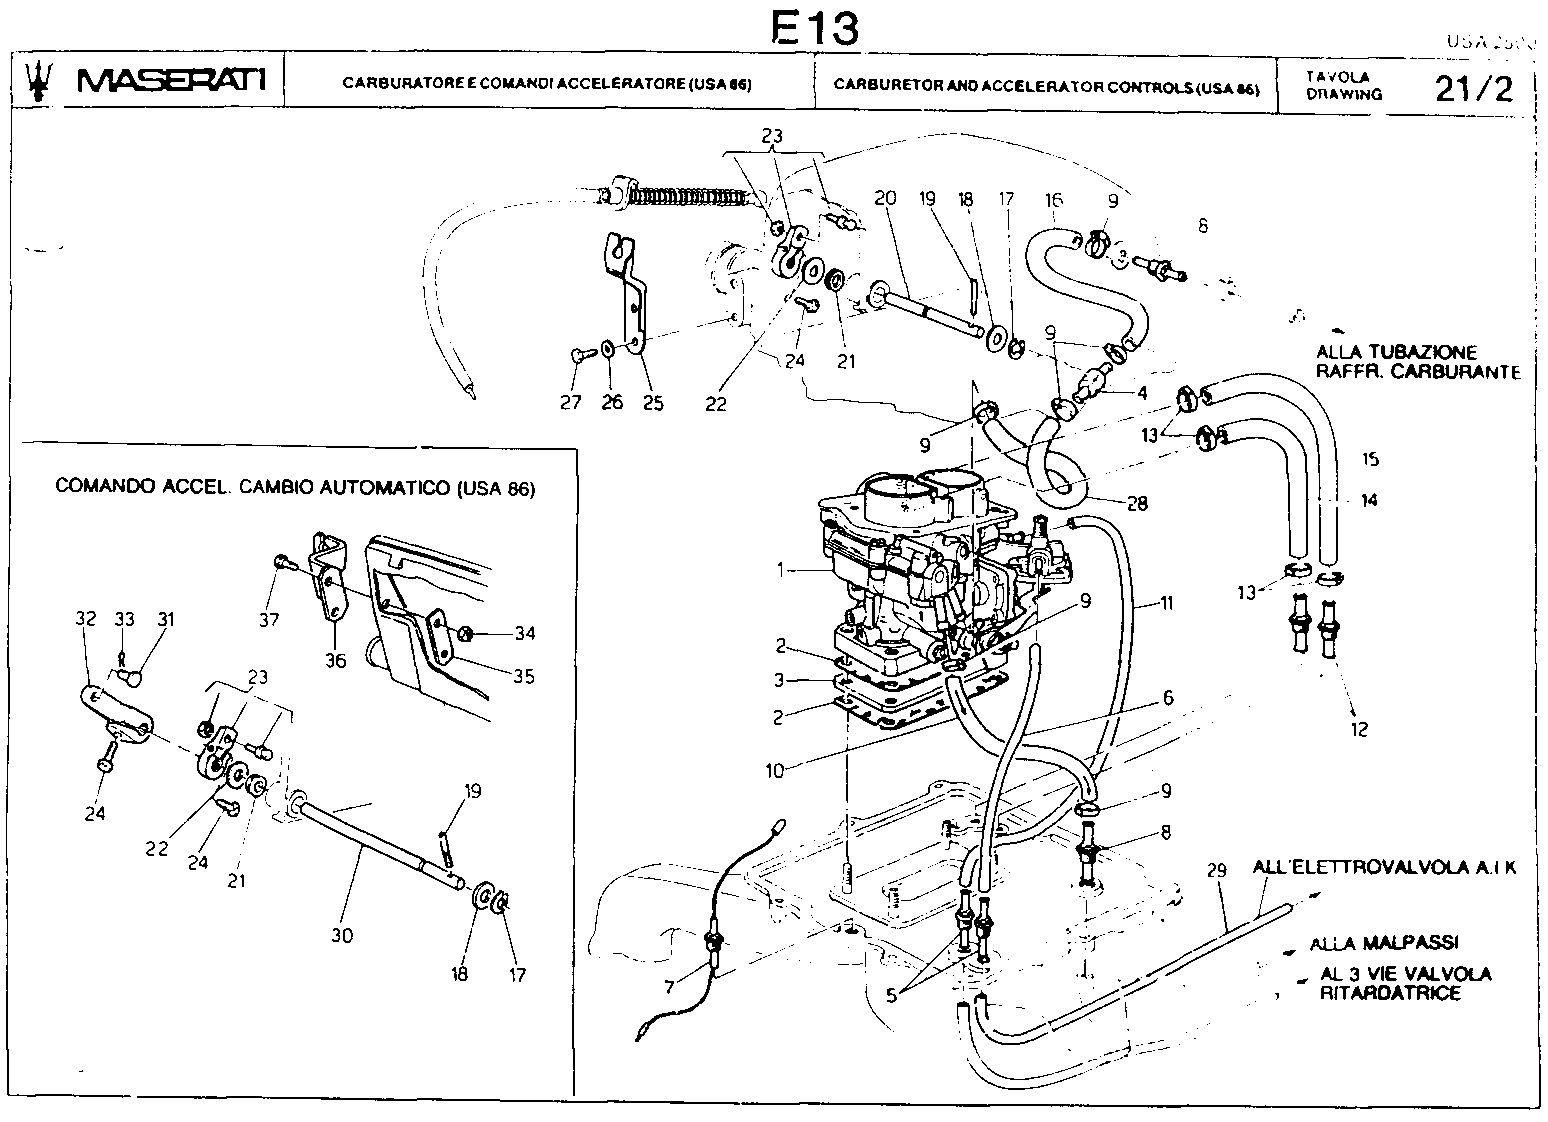 porsche 944 s2 wiring diagram headlight motor miata 1985 part html imageresizertool com